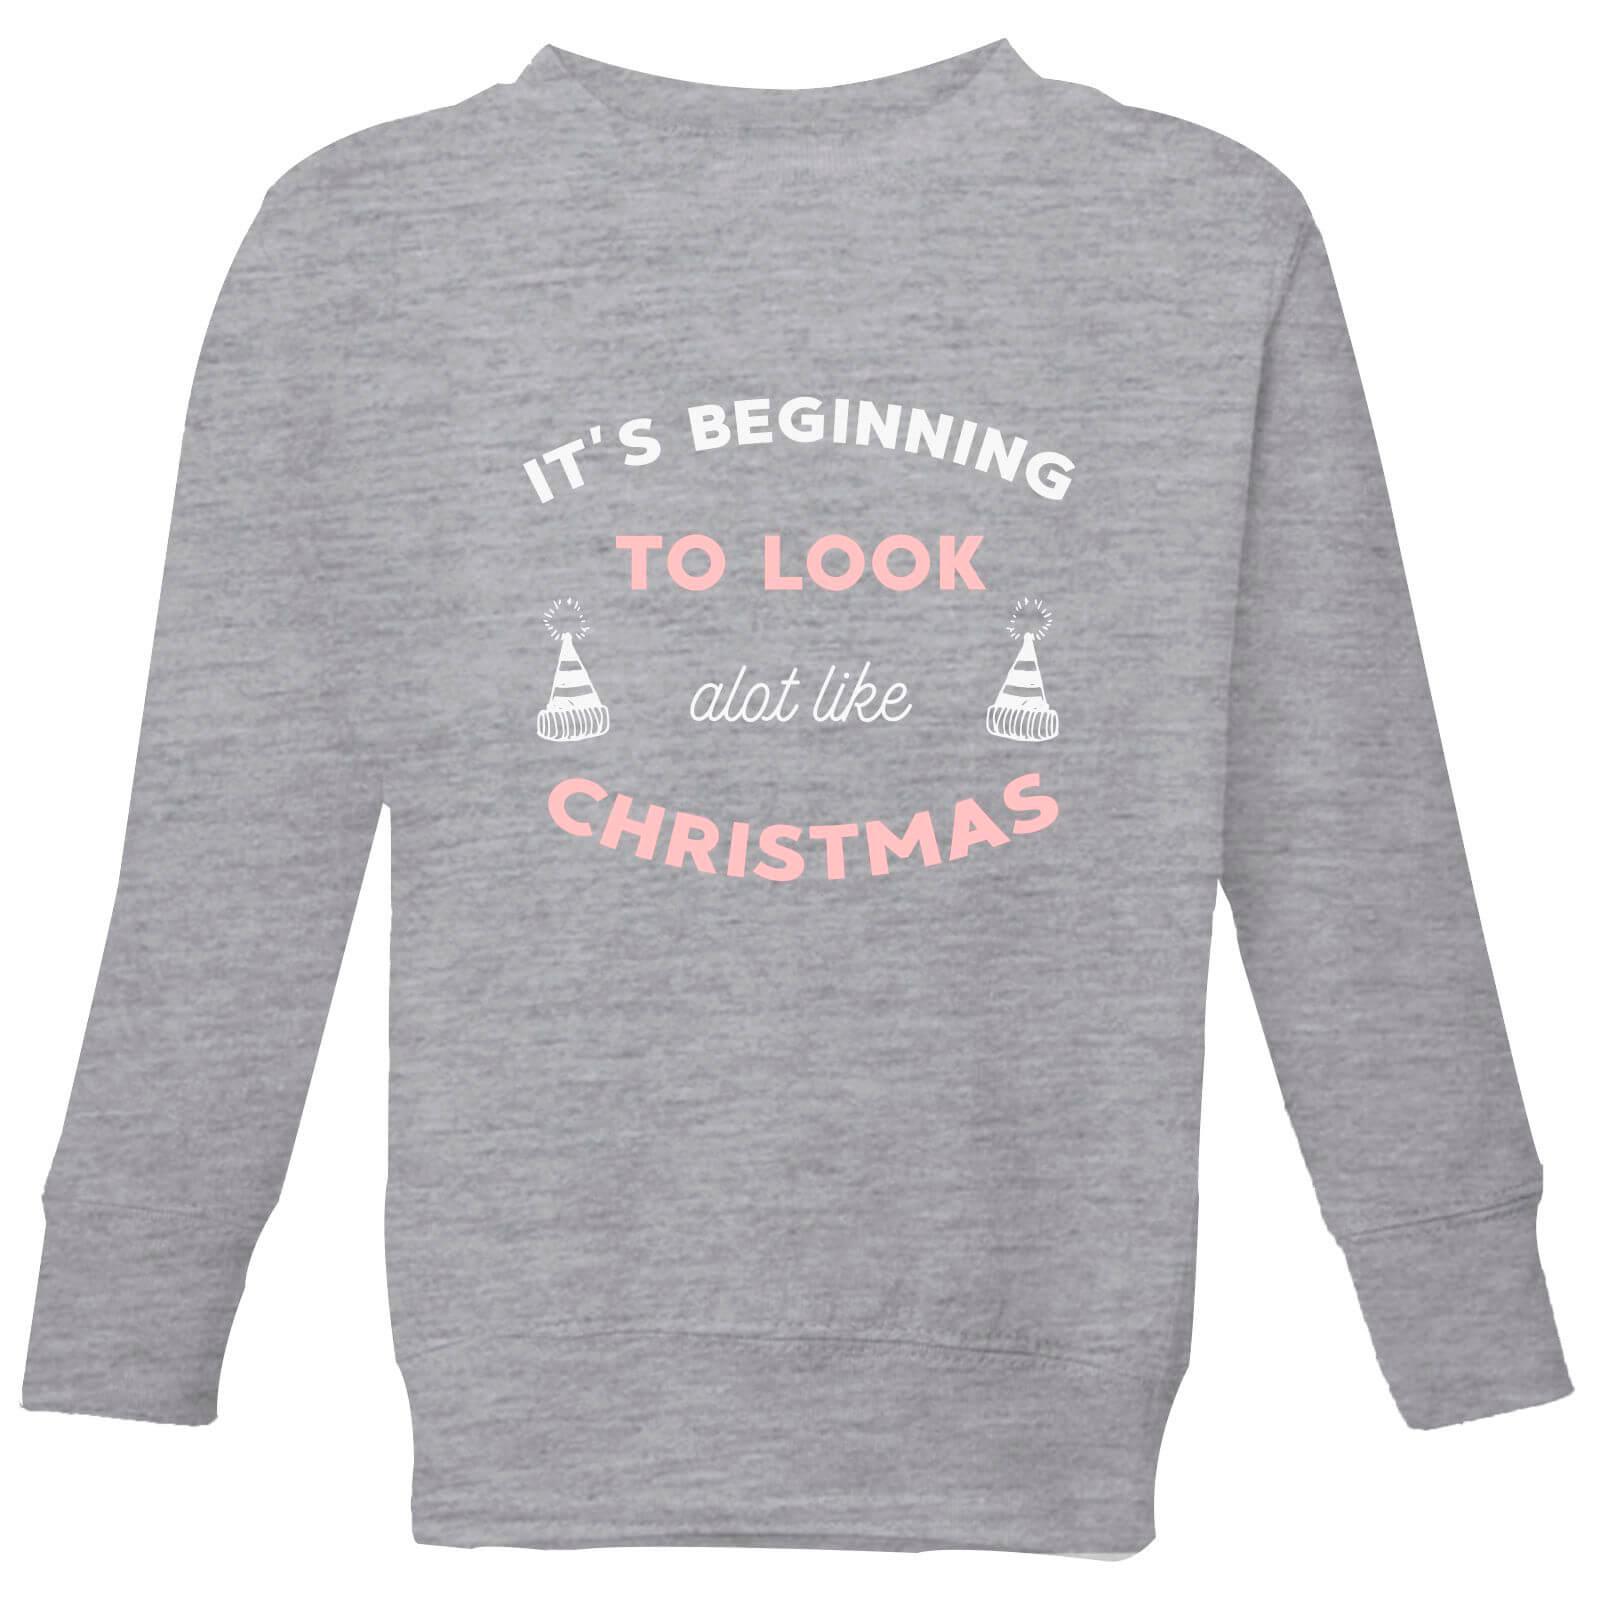 Its Beginning To Look Alot Like Christmas.It S Beginning To Look A Lot Like Christmas Kids Christmas Sweatshirt Grey